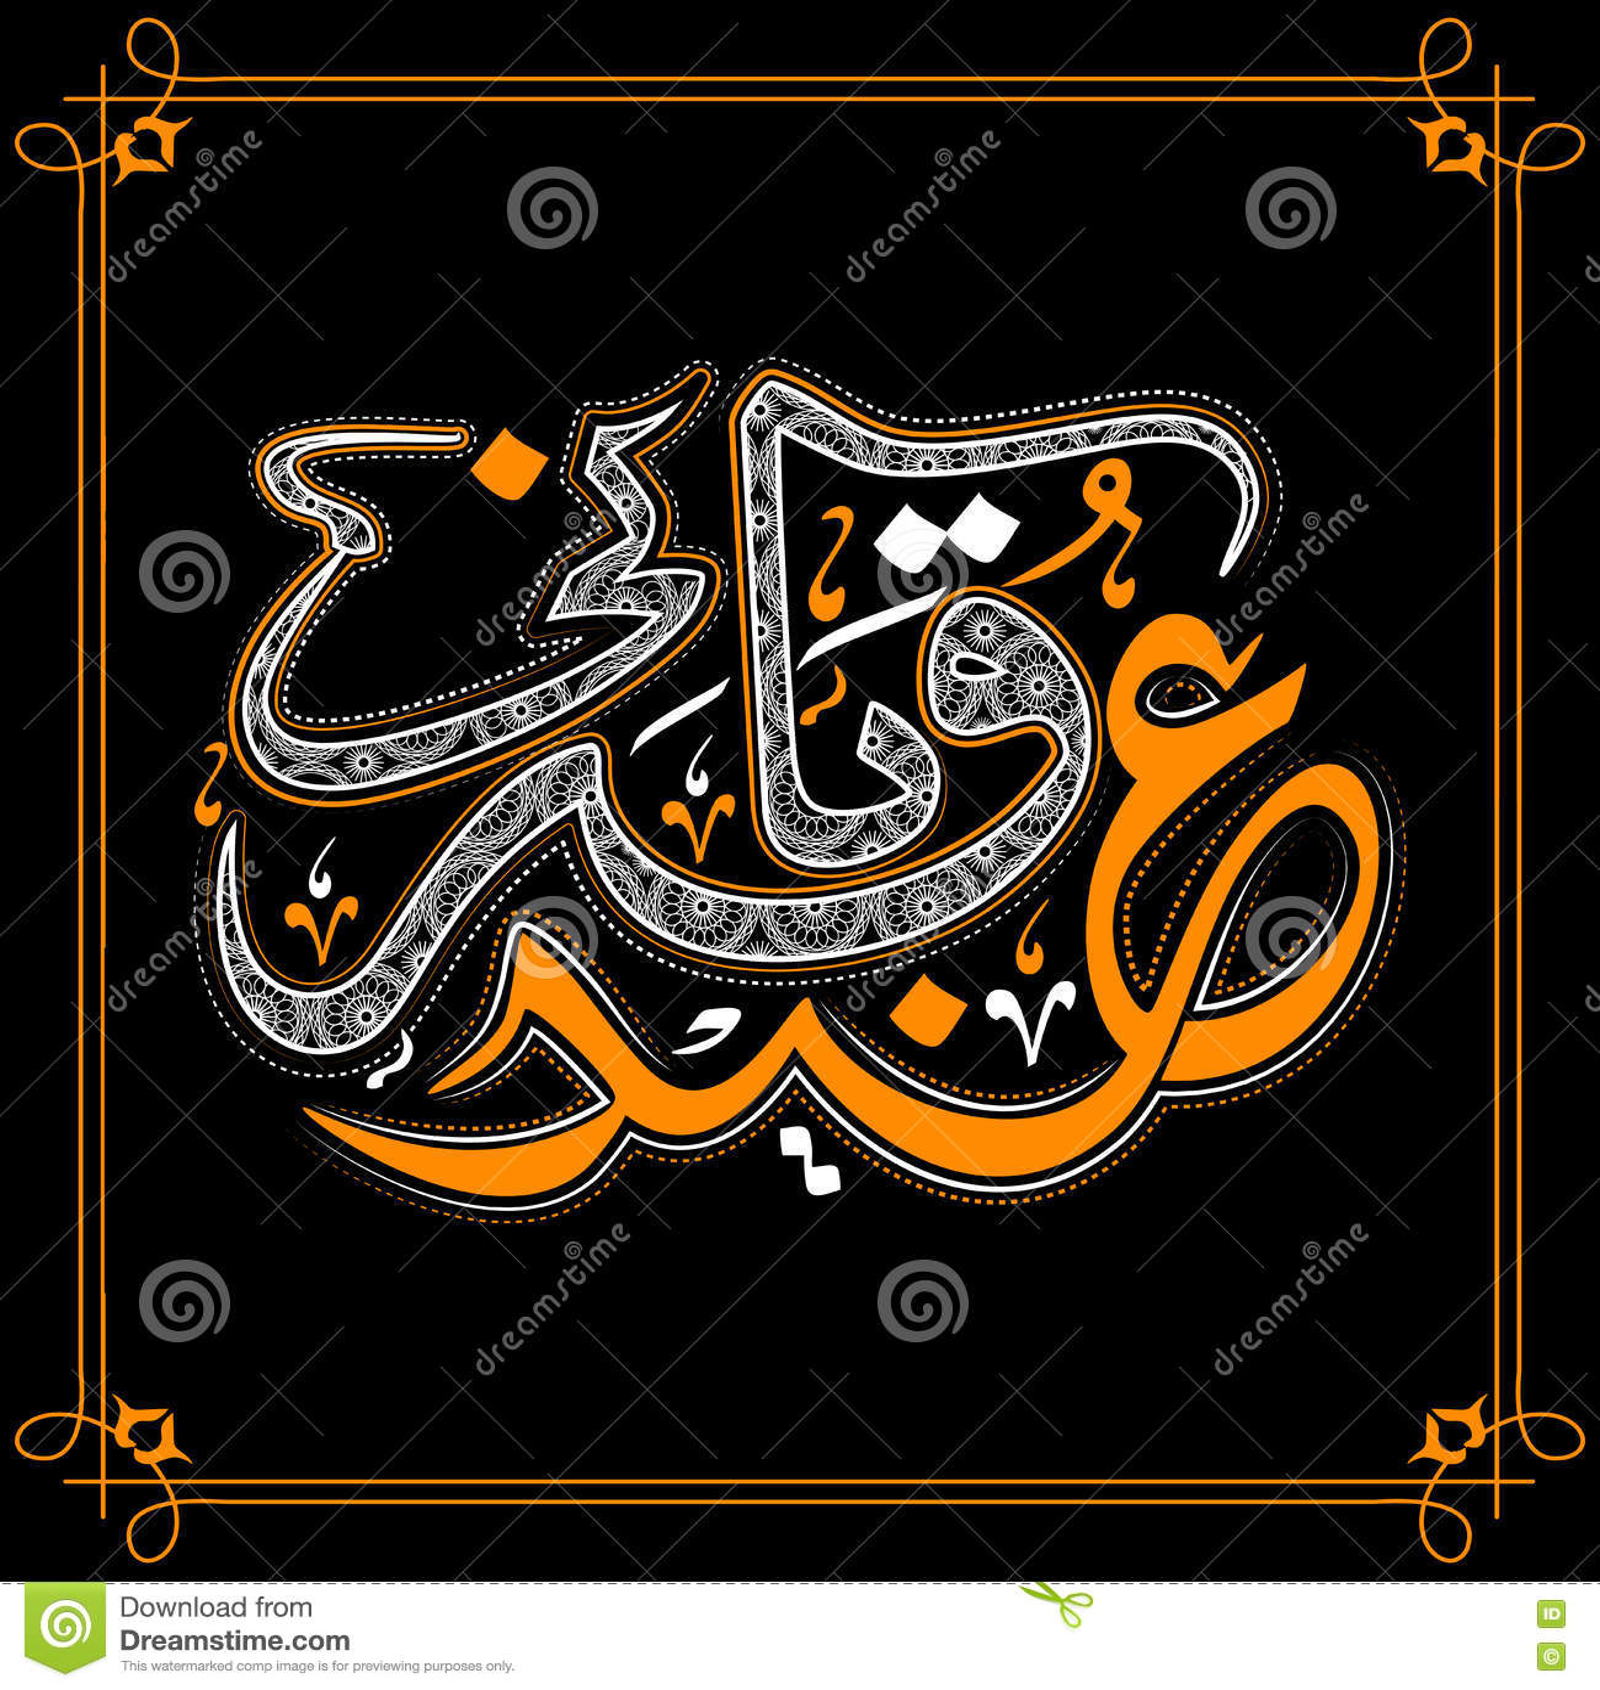 Arabic Calligraphy For Eid Al Adha Celebration Stock Illustration